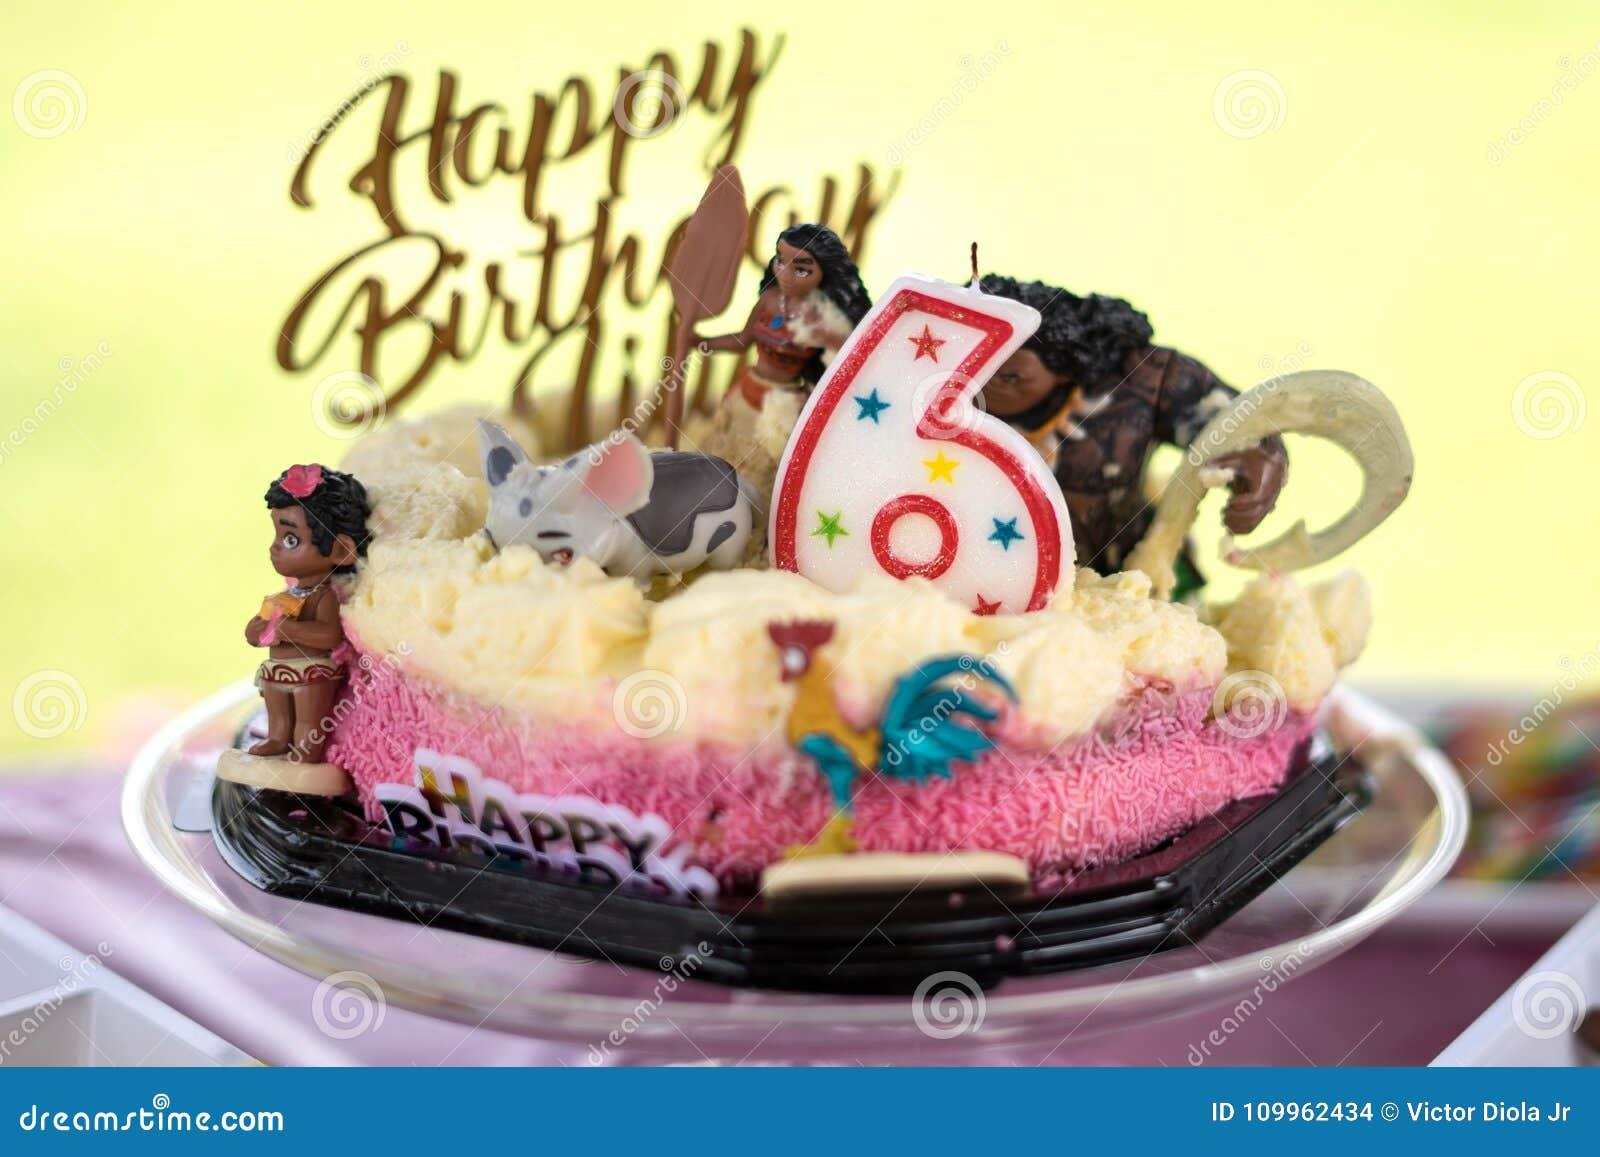 6th Happy Birthday Cake